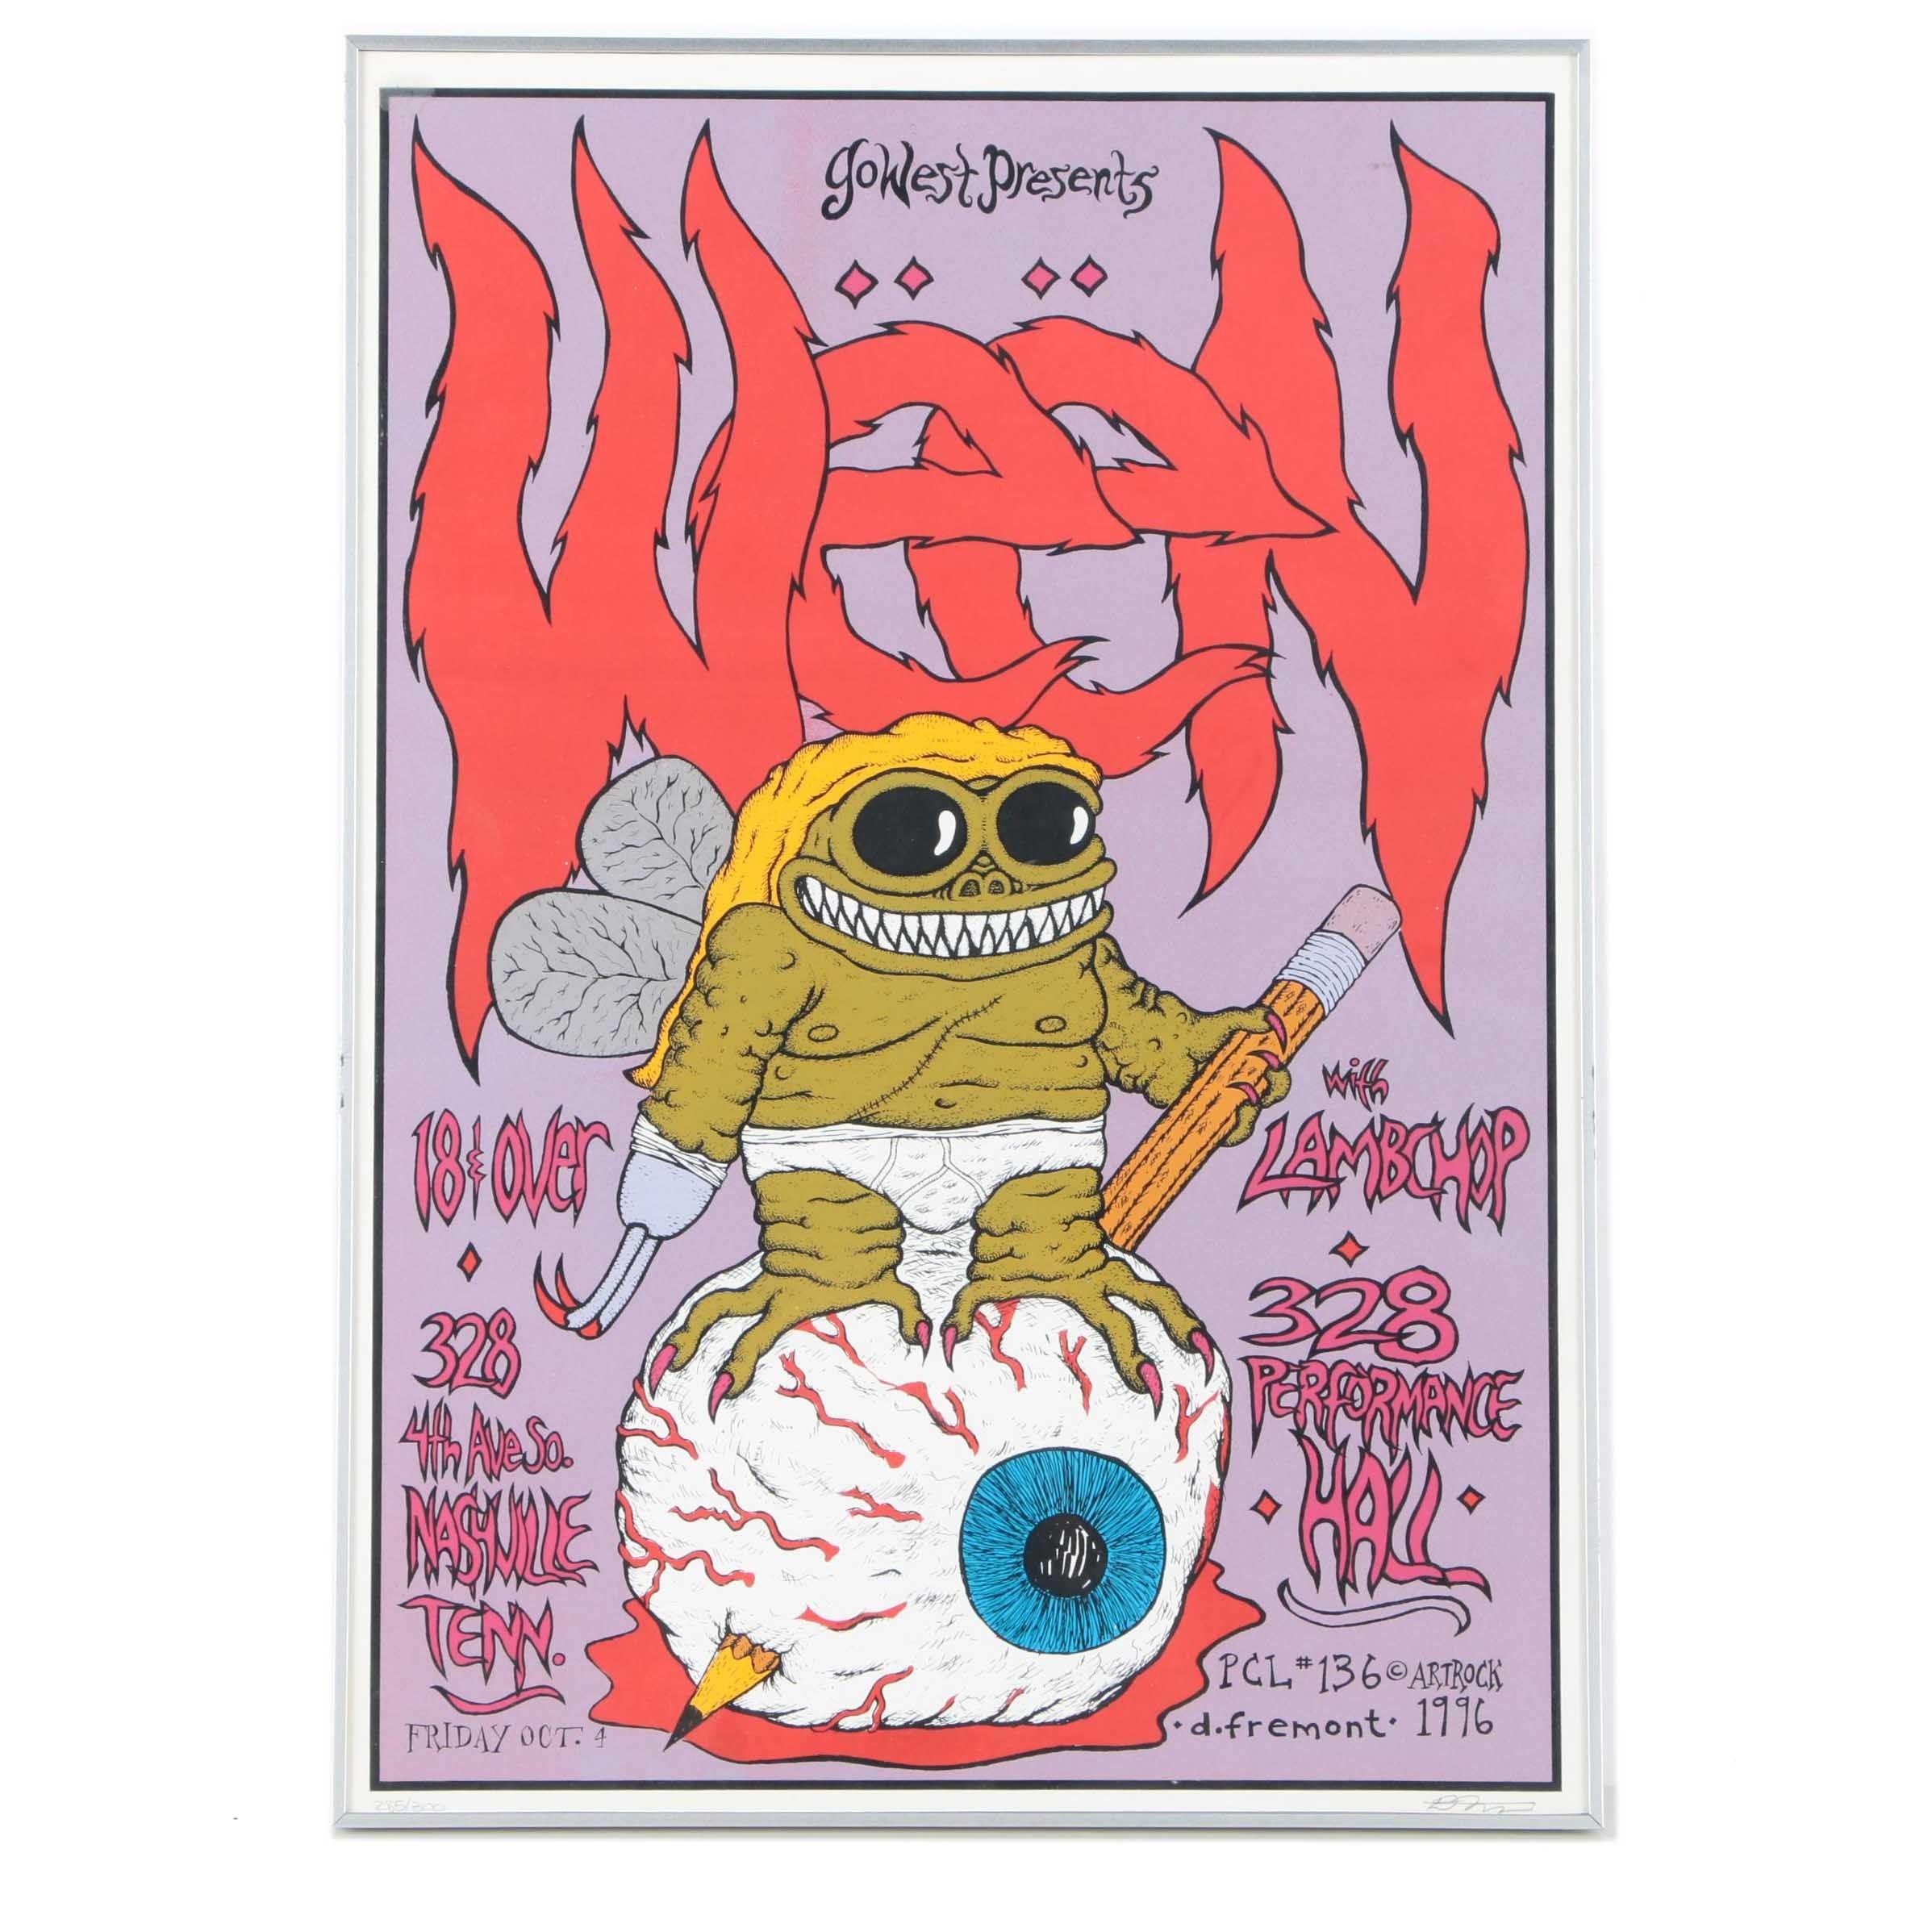 David Fremont Limited Edition Serigraph Concert Poster